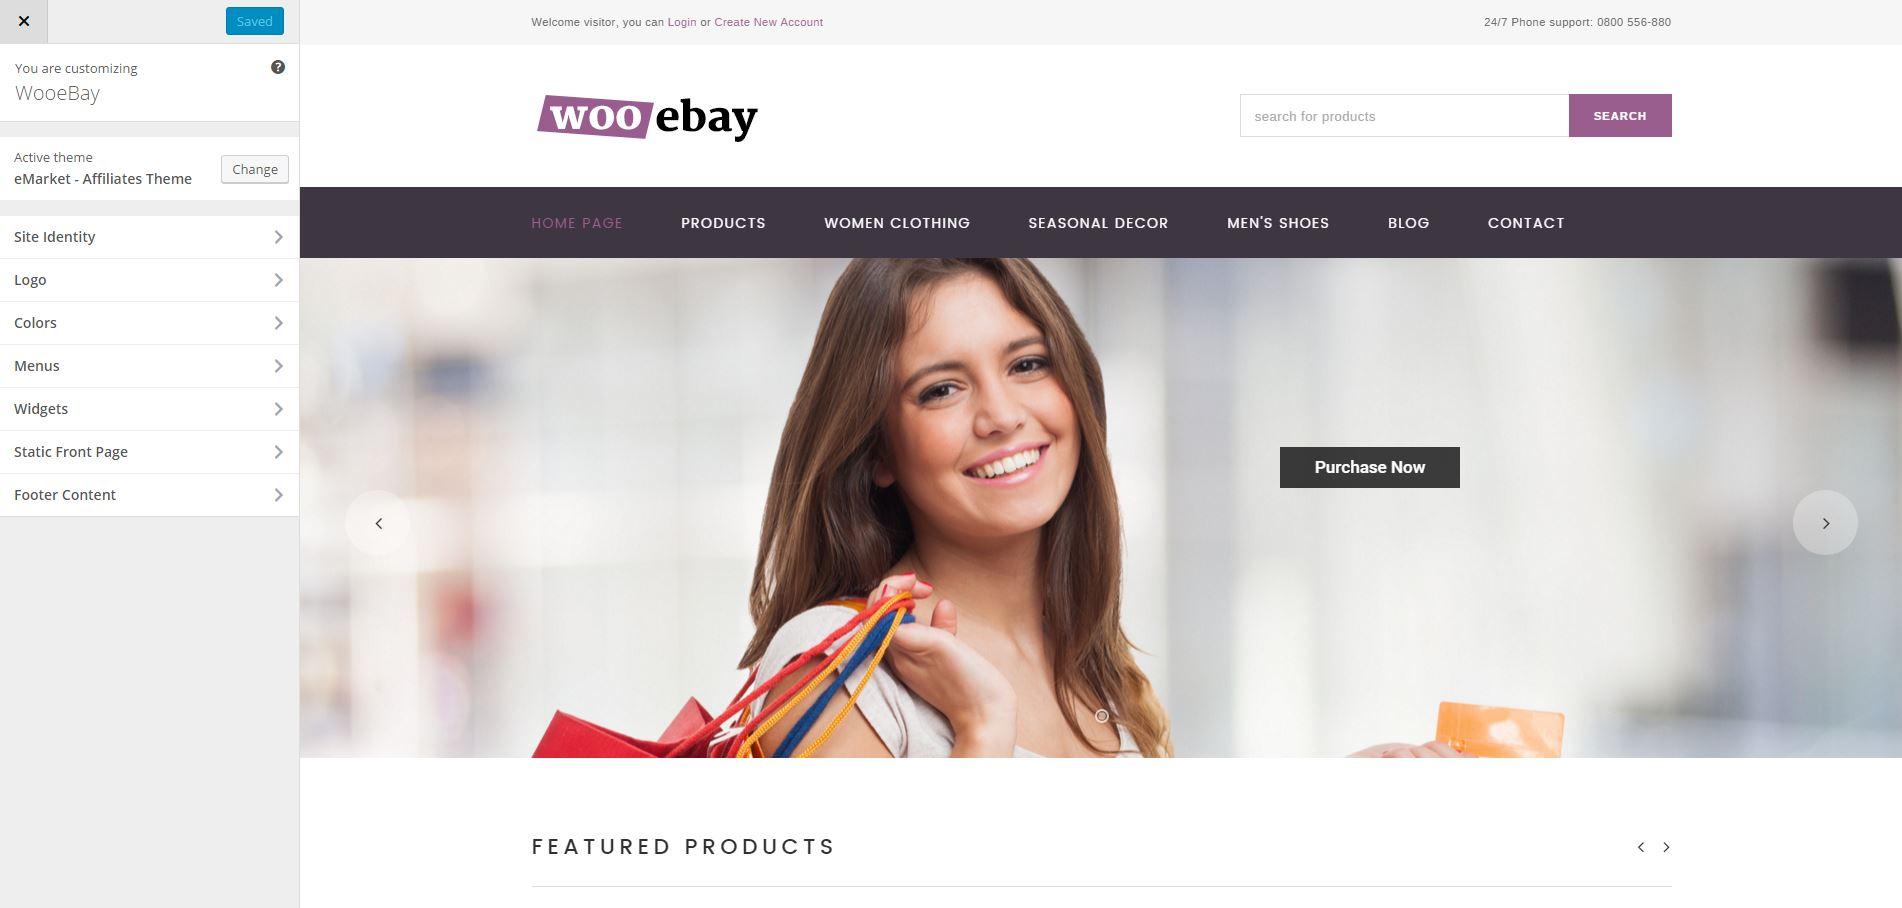 wooebay-customize